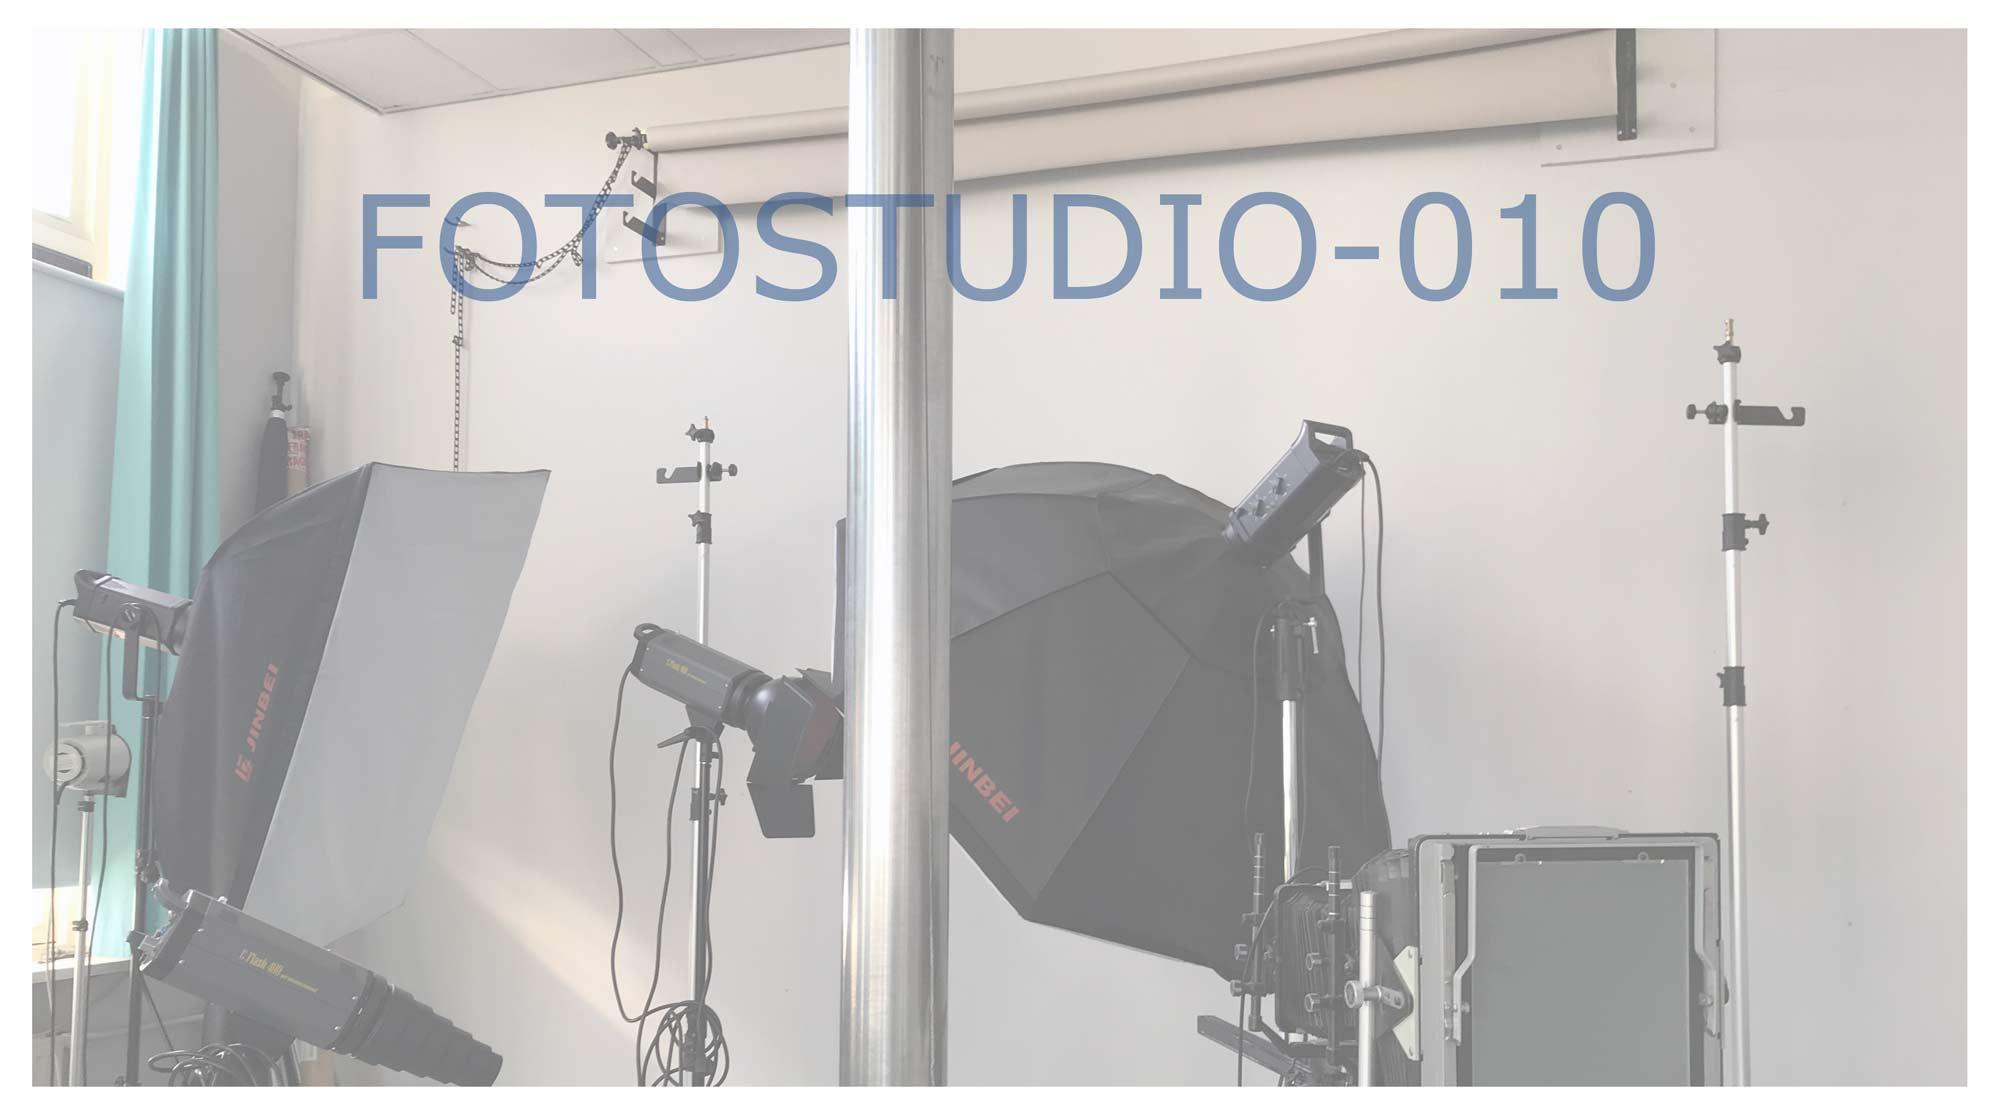 studioverhuur rotterdam workshops fotografie